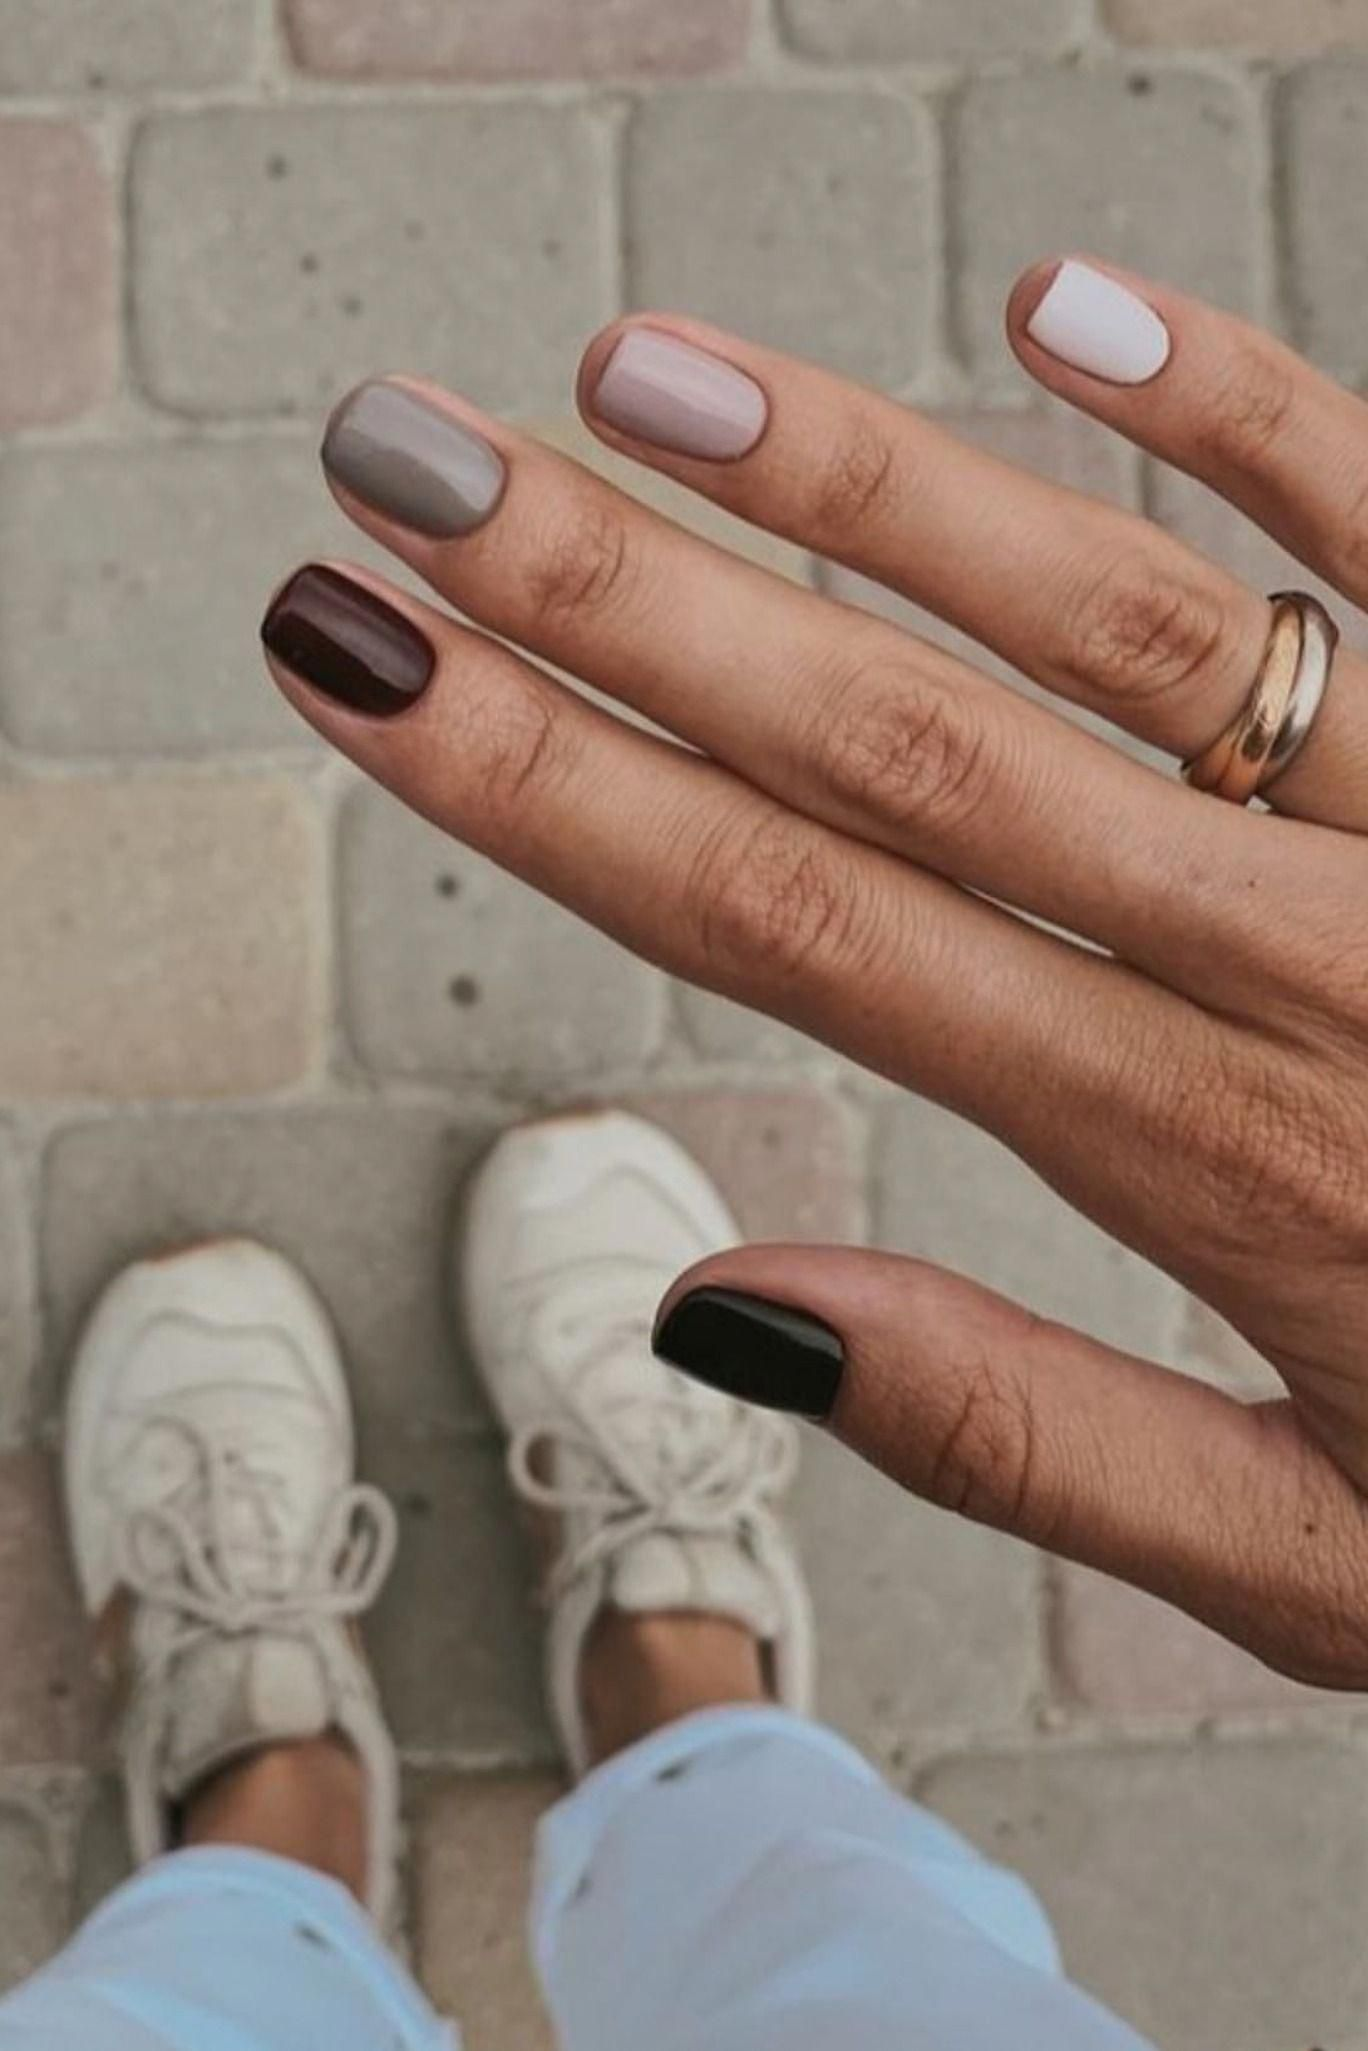 Nagelverzorging online kopen | Fashionchick.nl | Groot aanbod